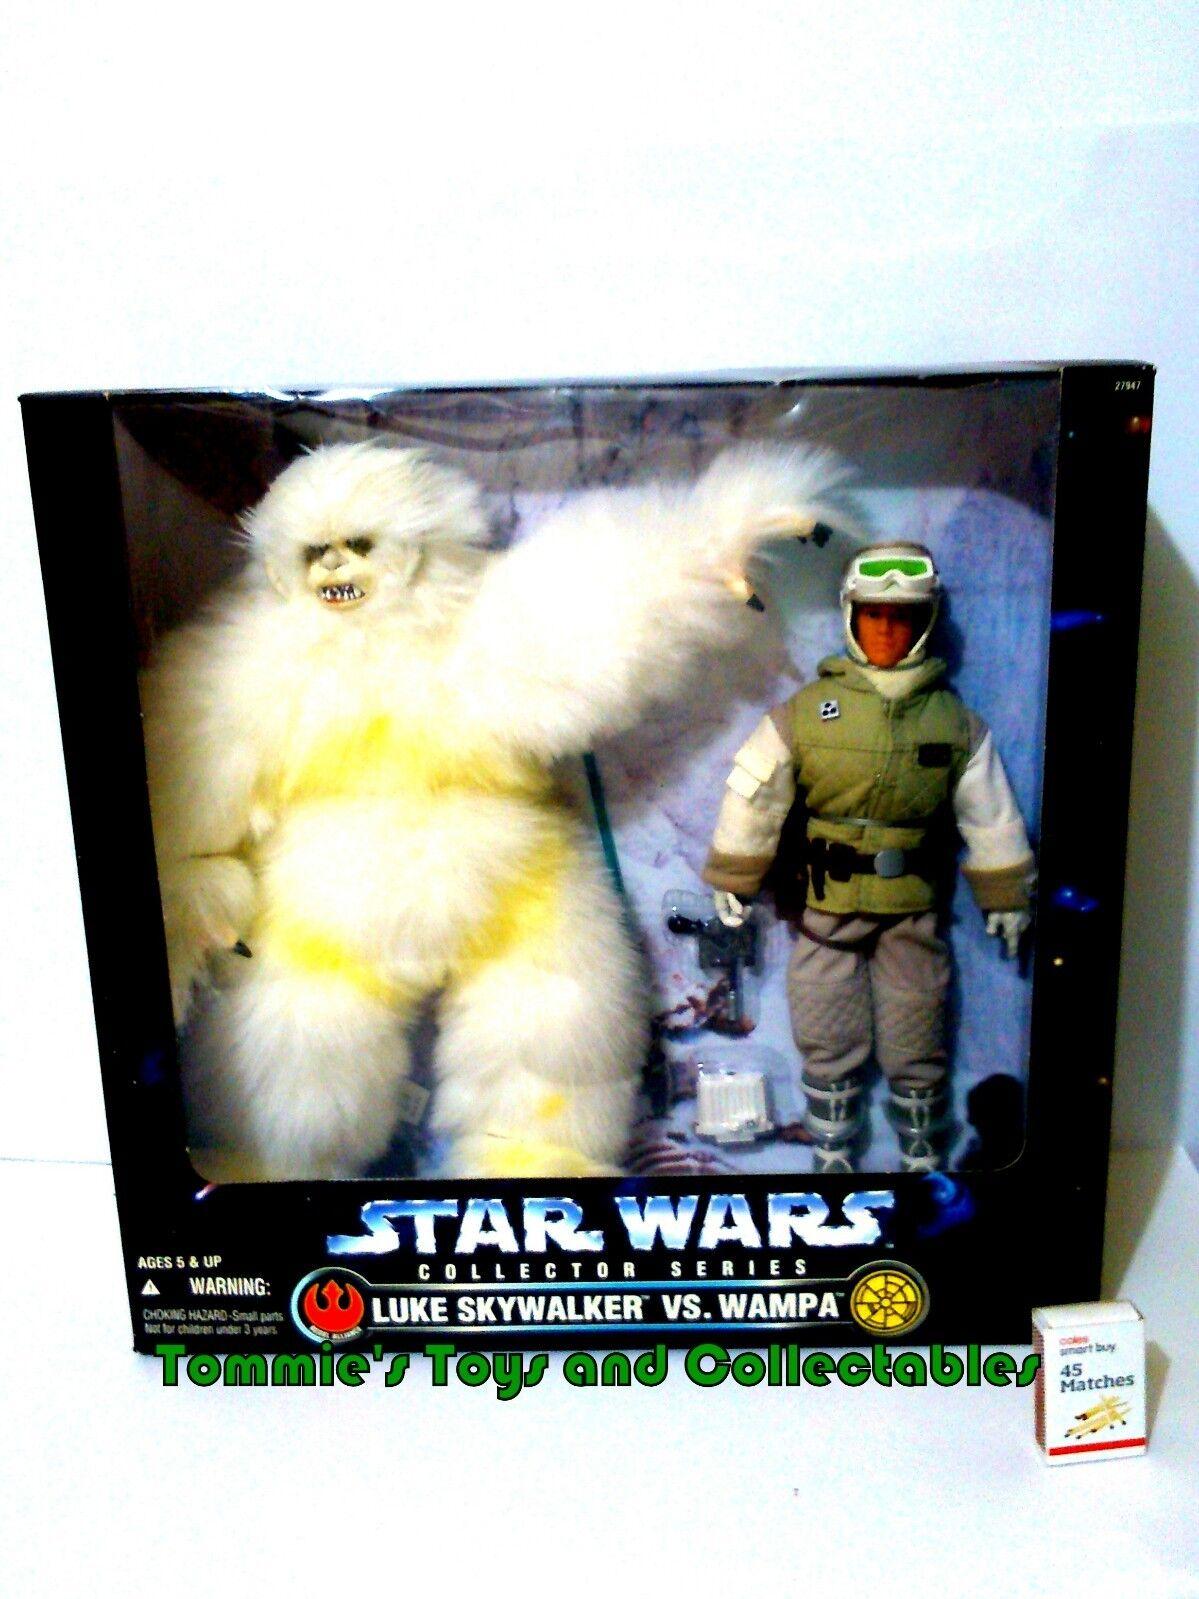 Star Wars Collector Series Luke Skywalker vs Wampa Kenner 1997 MIB